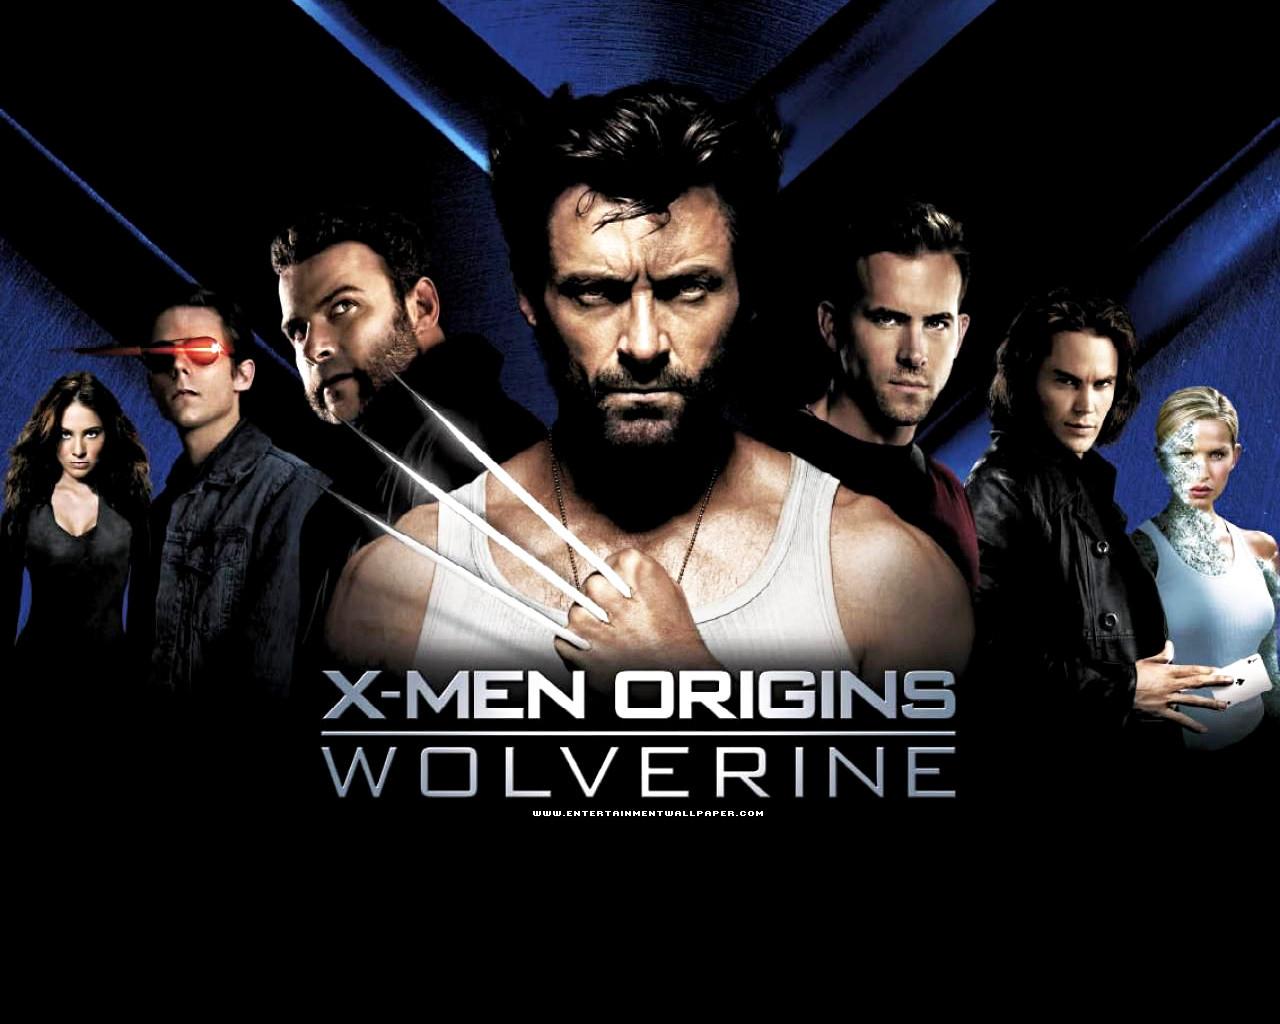 X Men Origins Wolverine Wallpapers Group 0 1280x1024